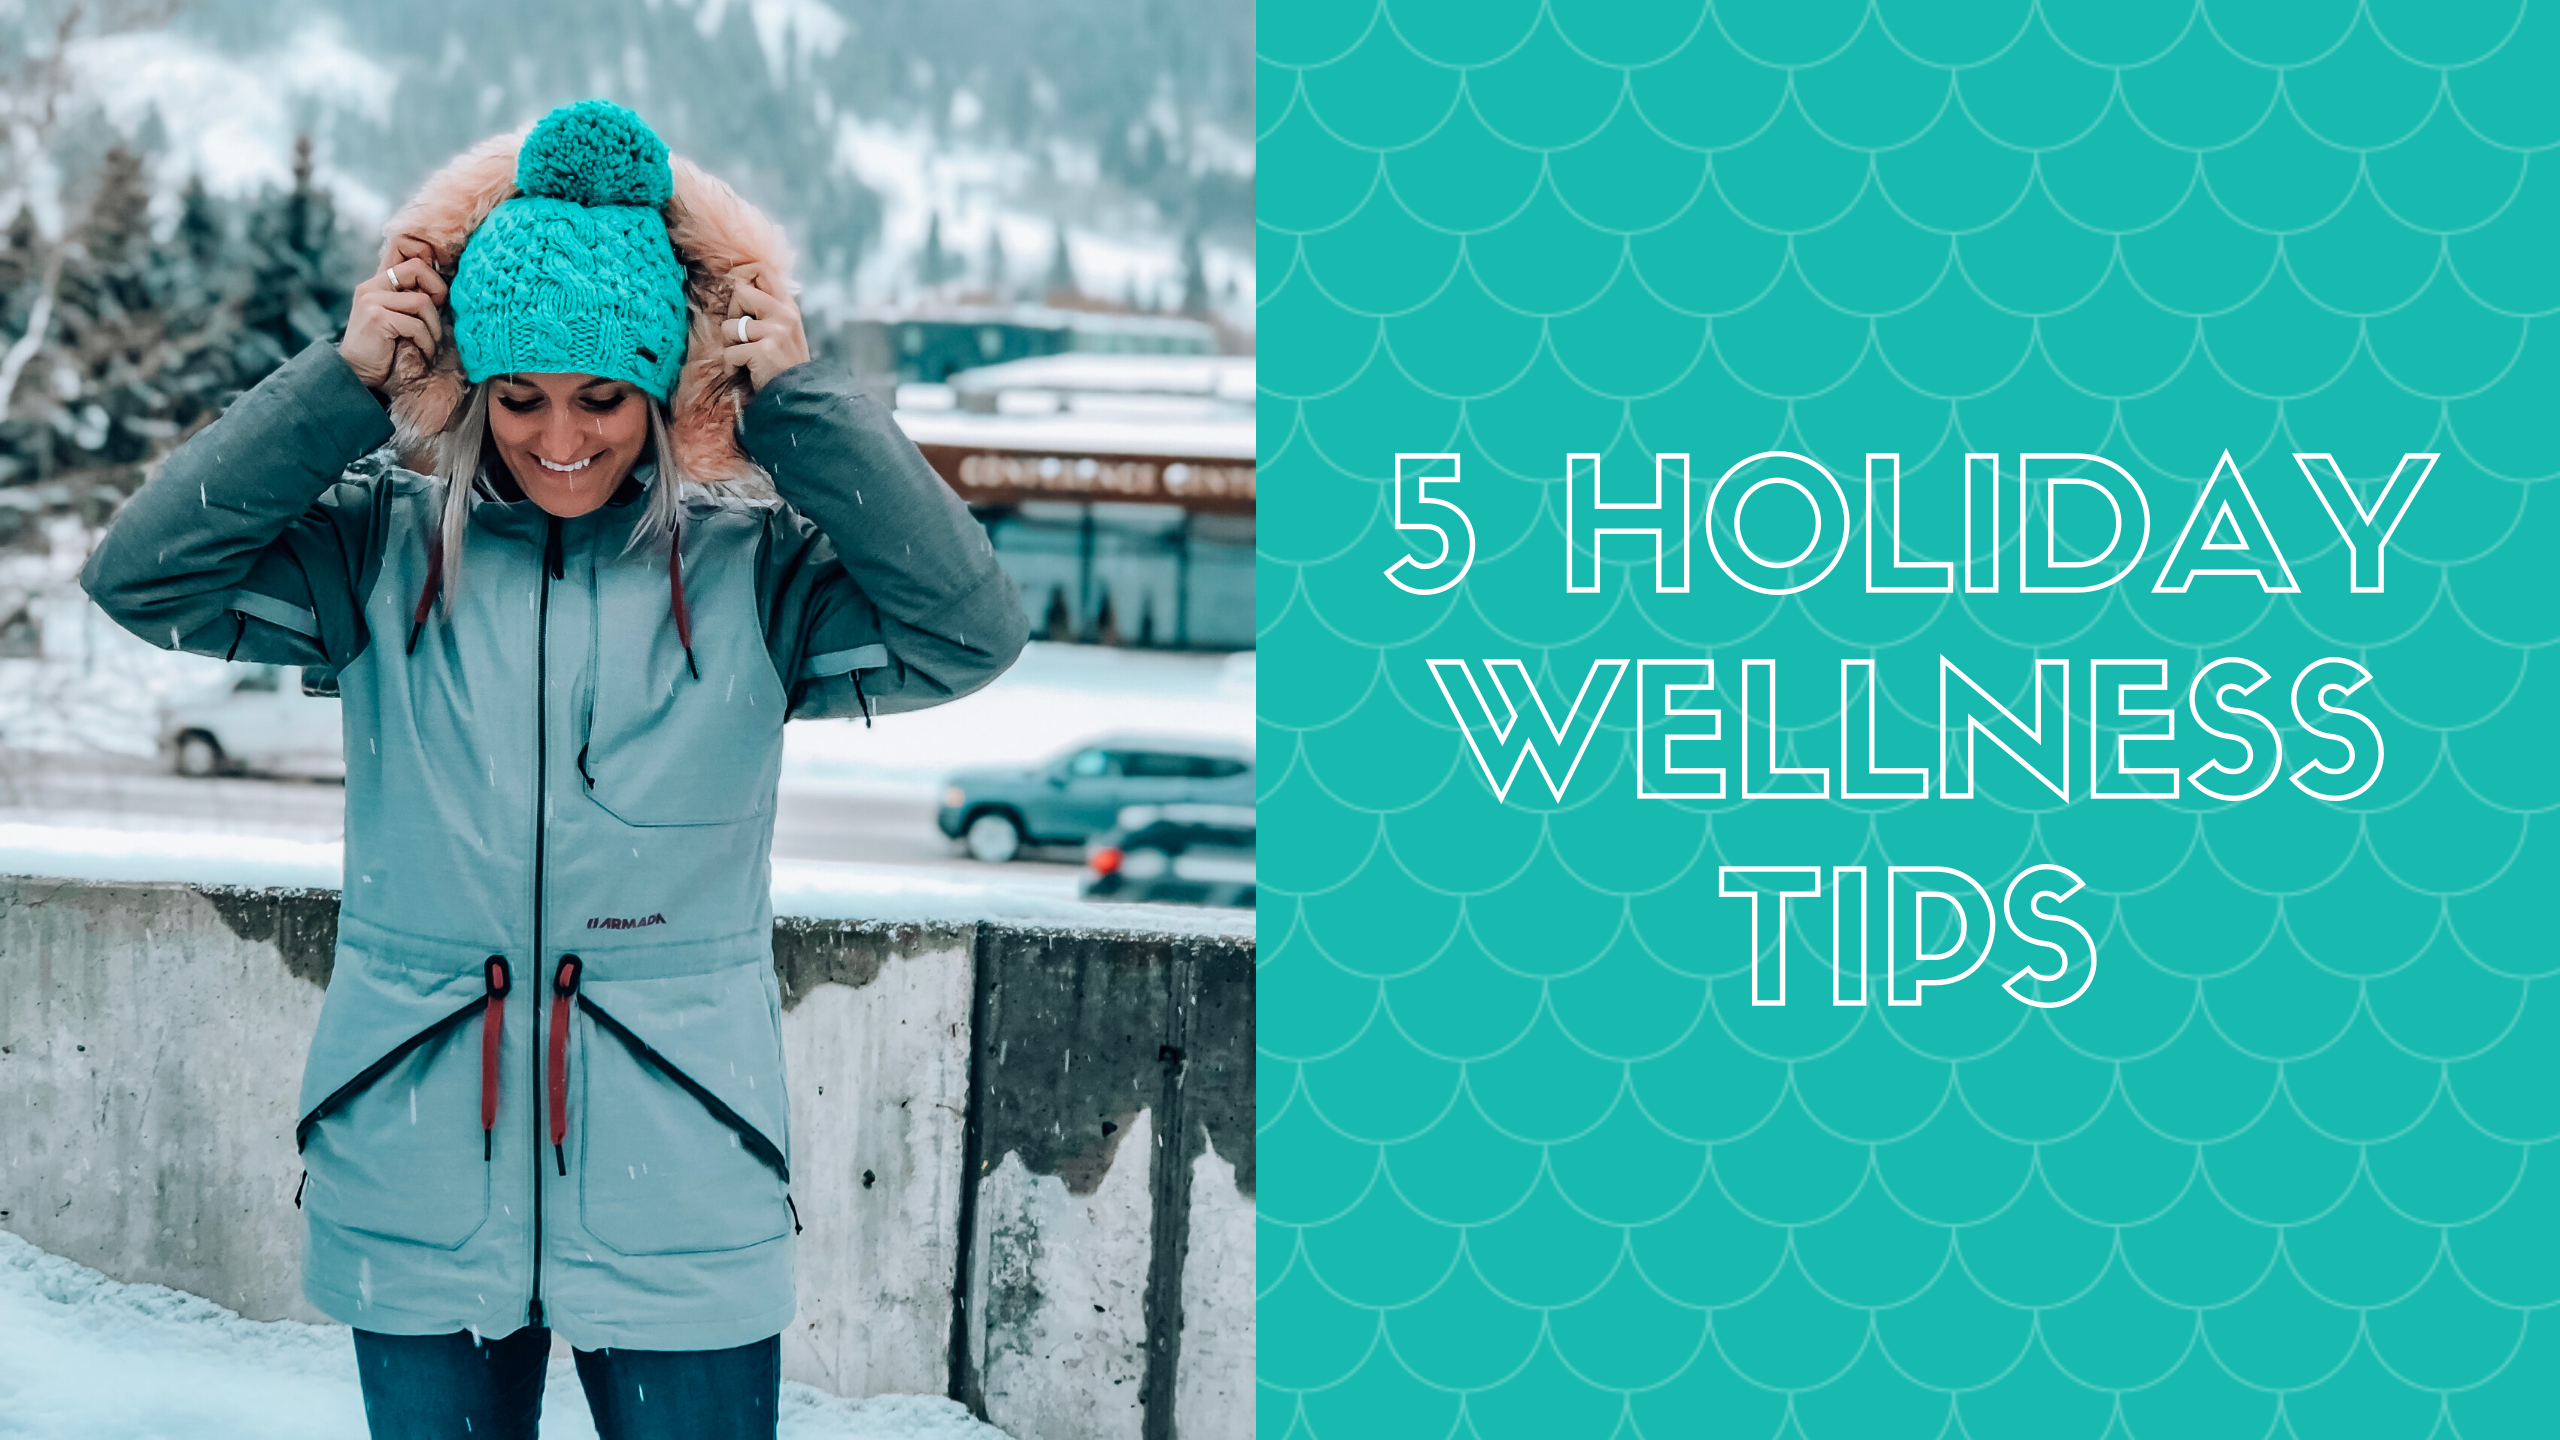 5 holiday wellness tips